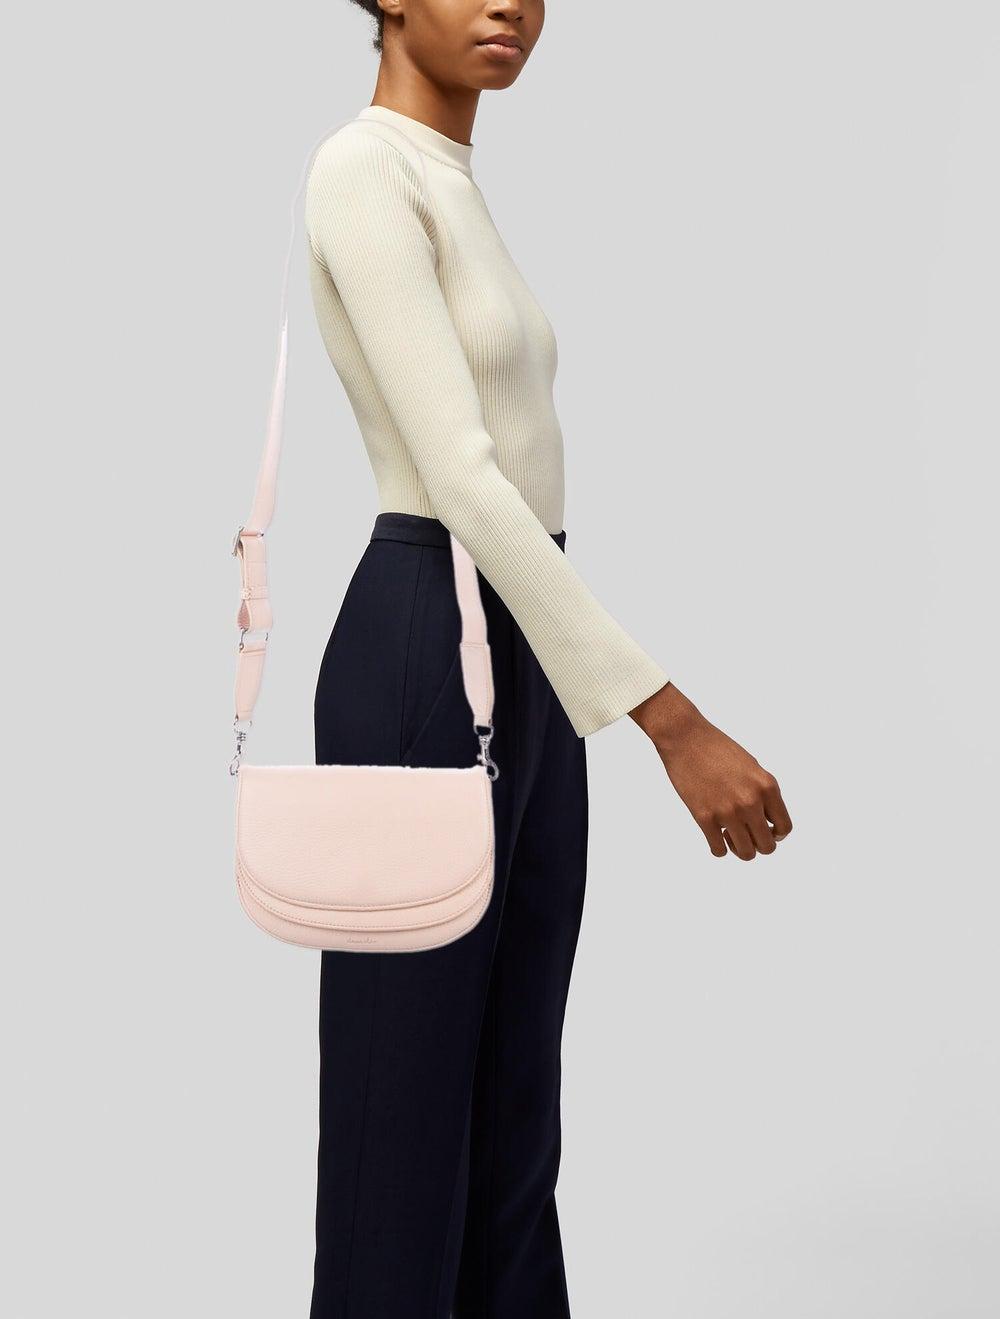 Steven Alan Leather Crossbody Bag Pink - image 2